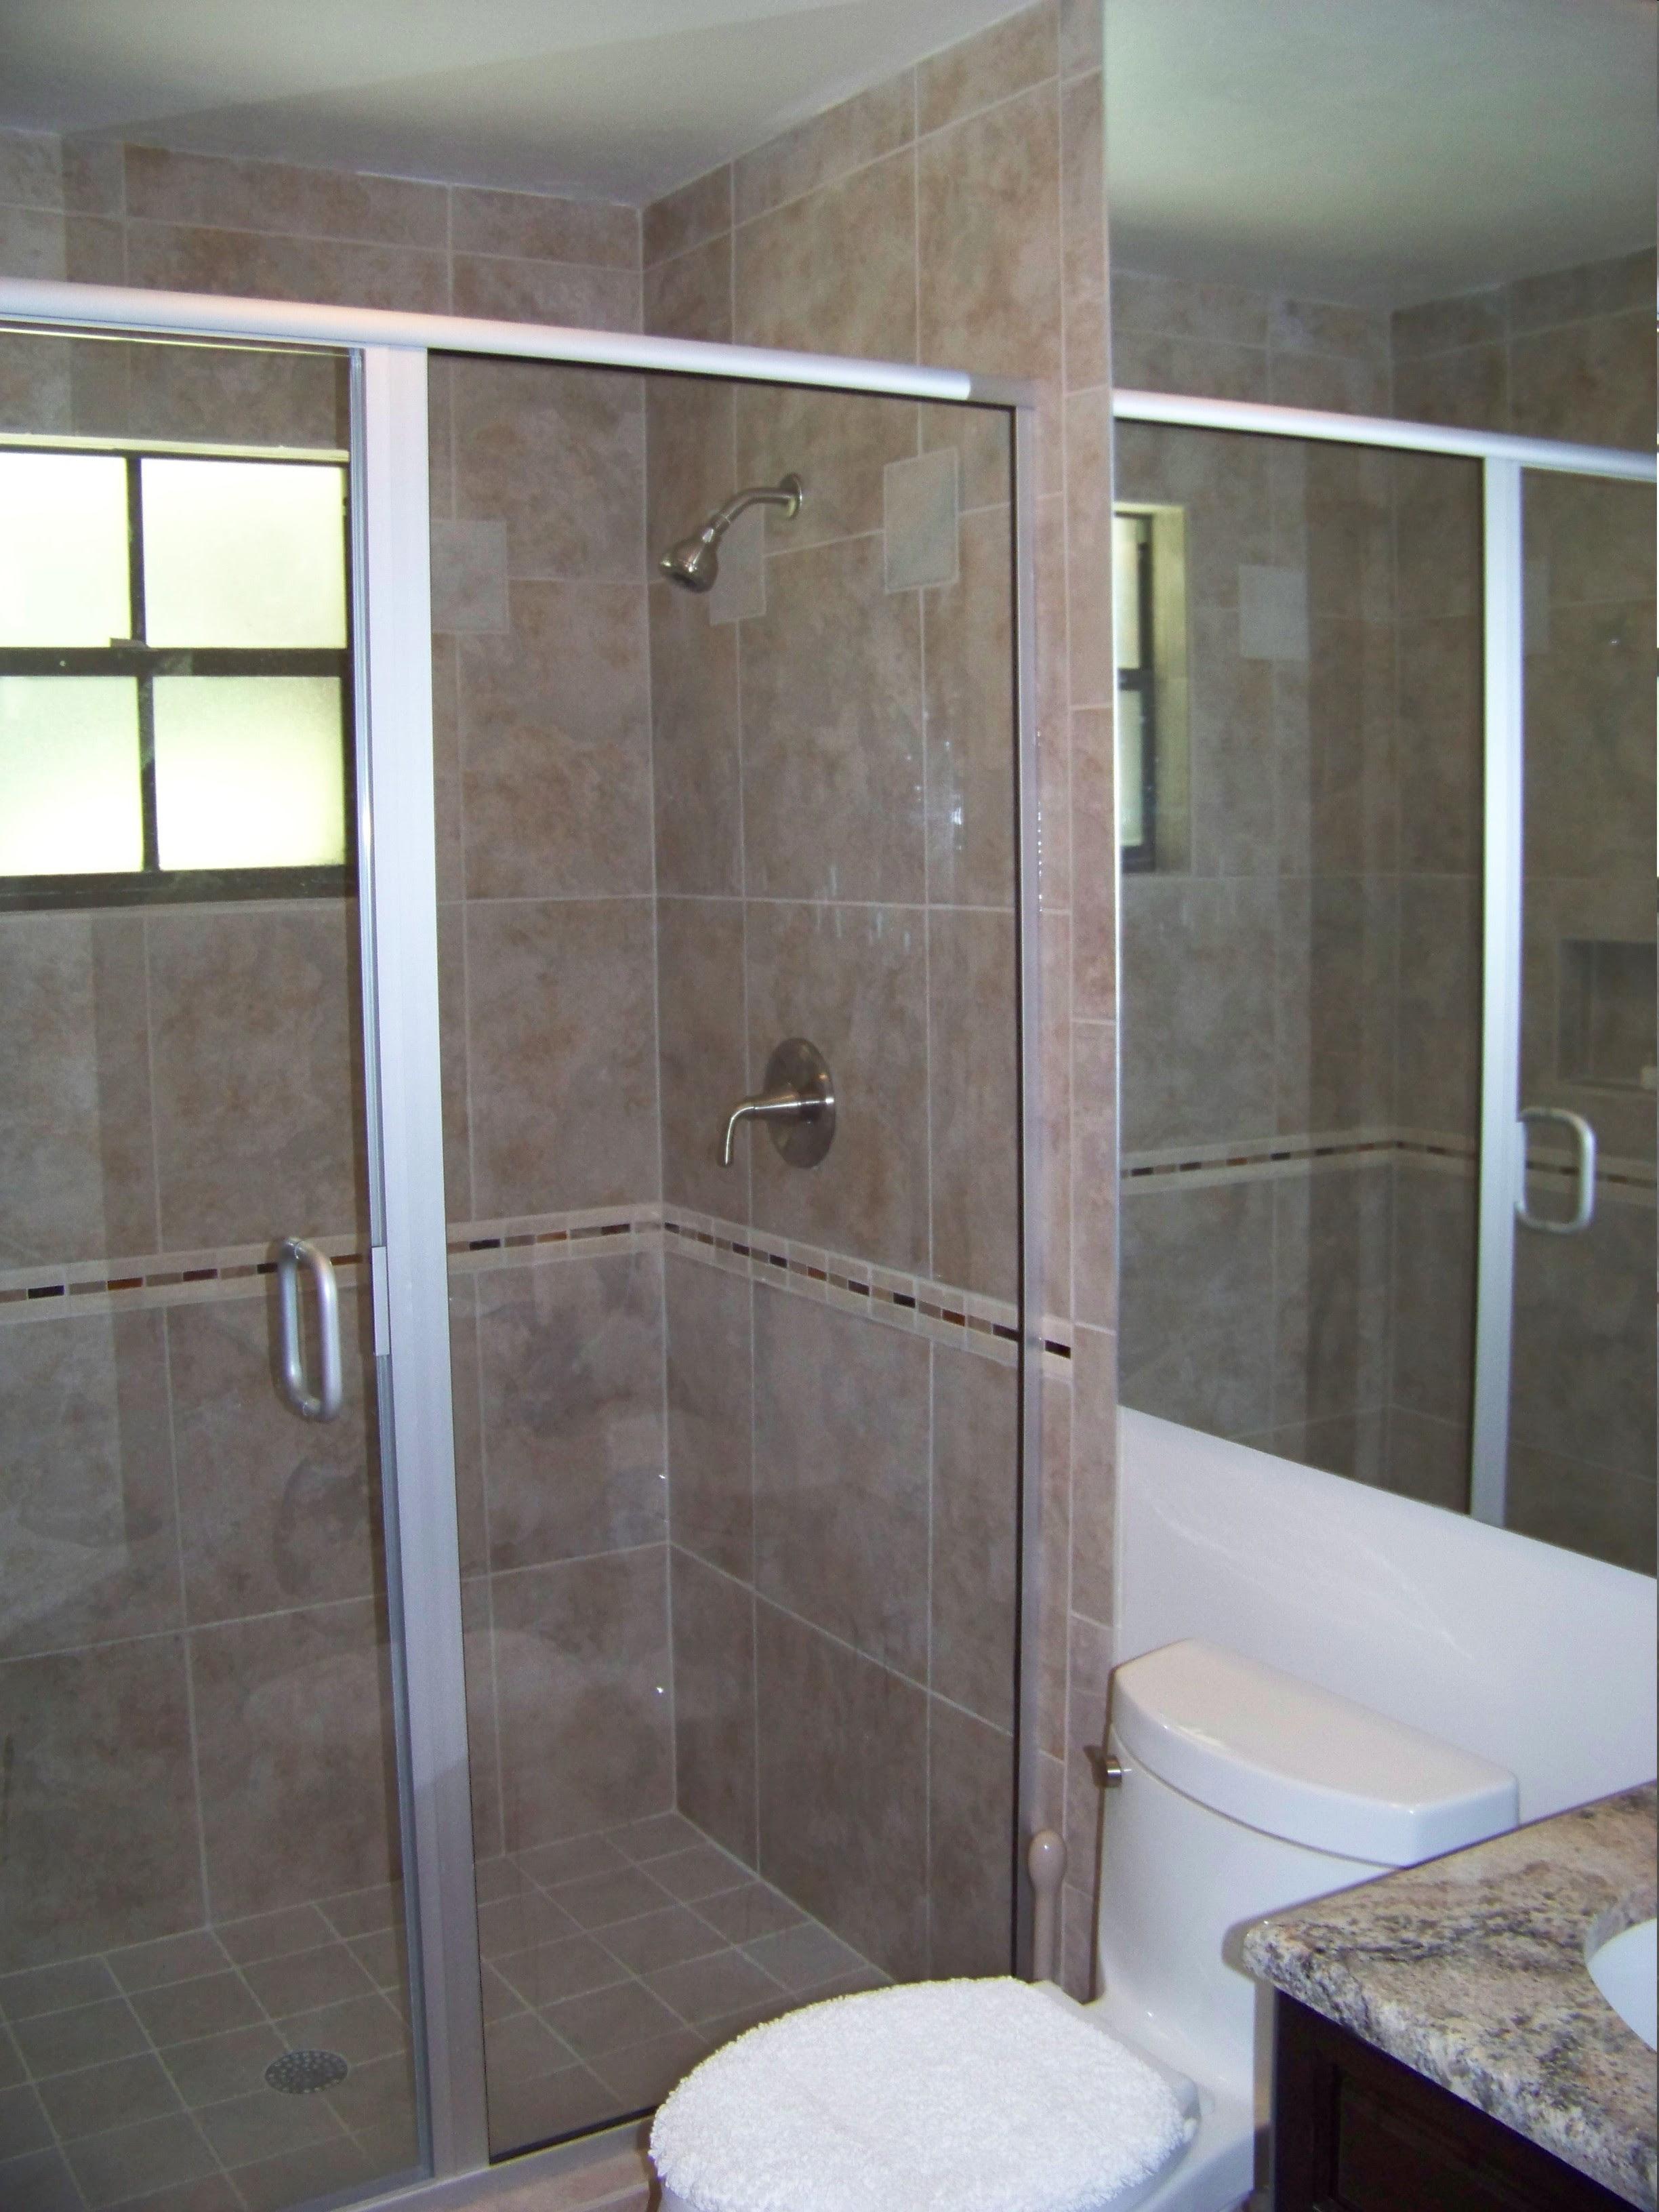 COPPER CEILING TILES IN BATHROOM | BATHROOM TILE